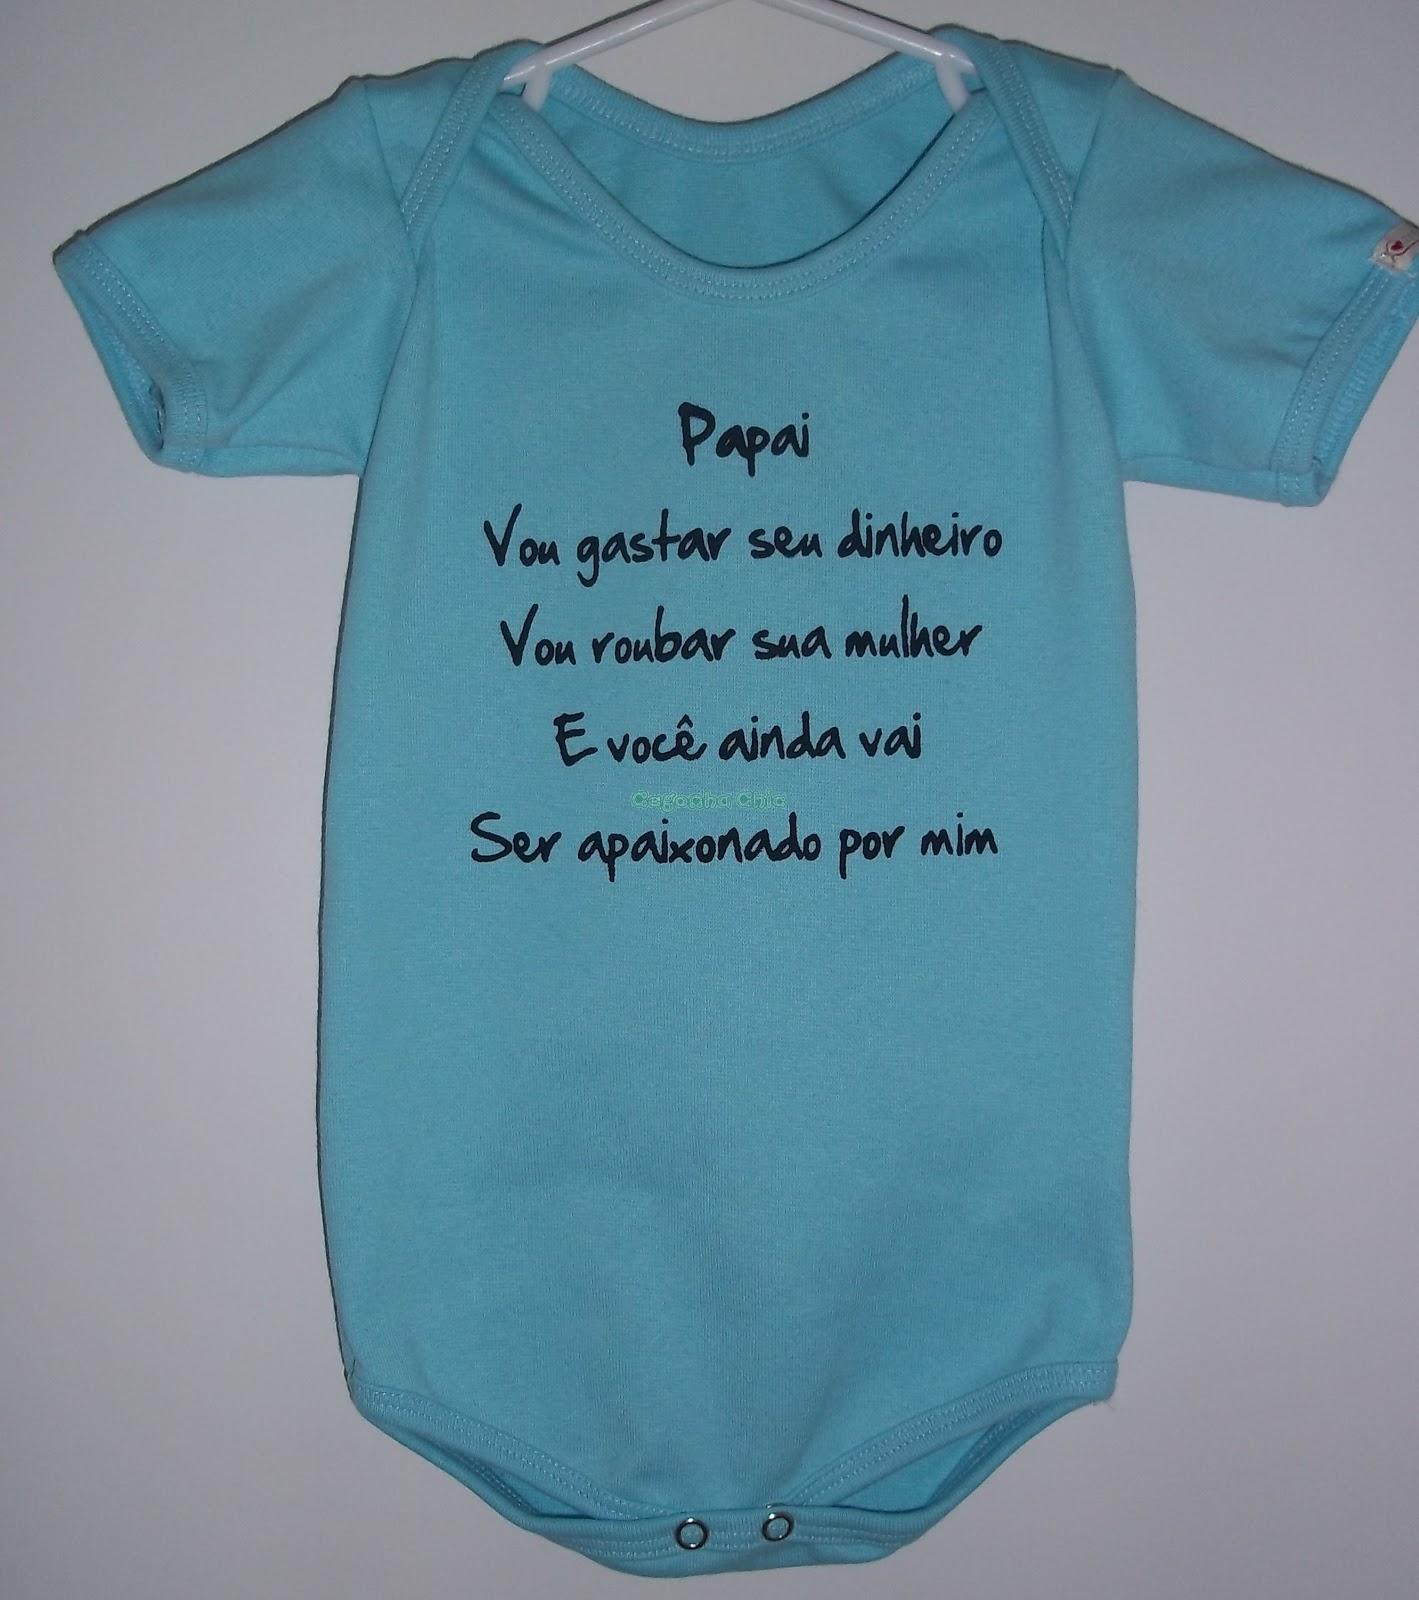 Diario De Uma Princesa Anna Beatriz 10012012 11012012